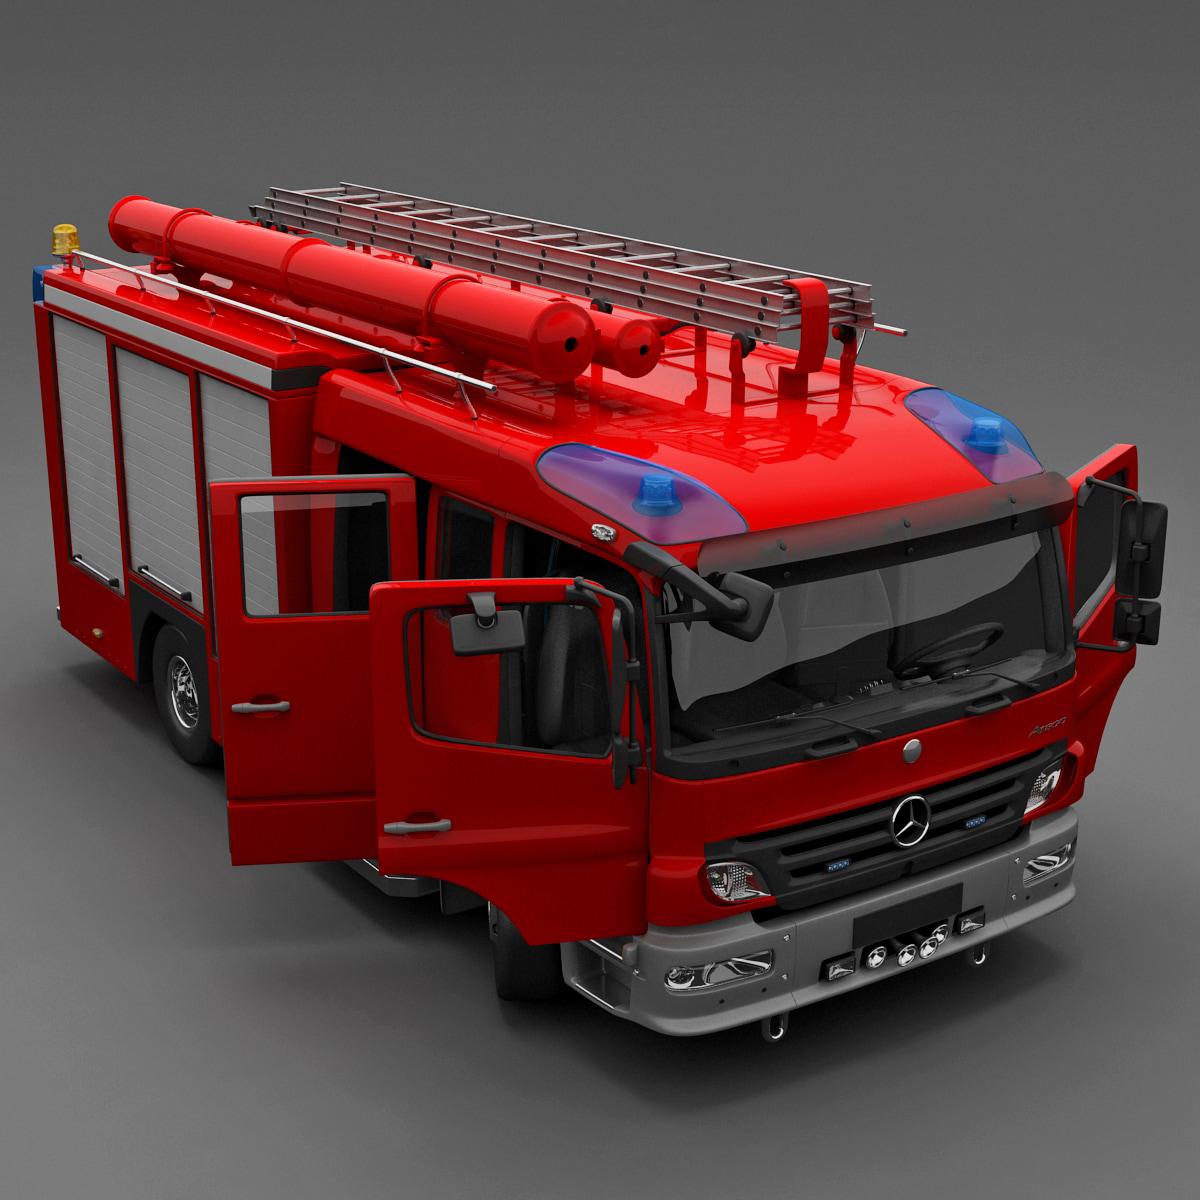 Mercedes_Atego_Fire_Truck_max_0001.jpg